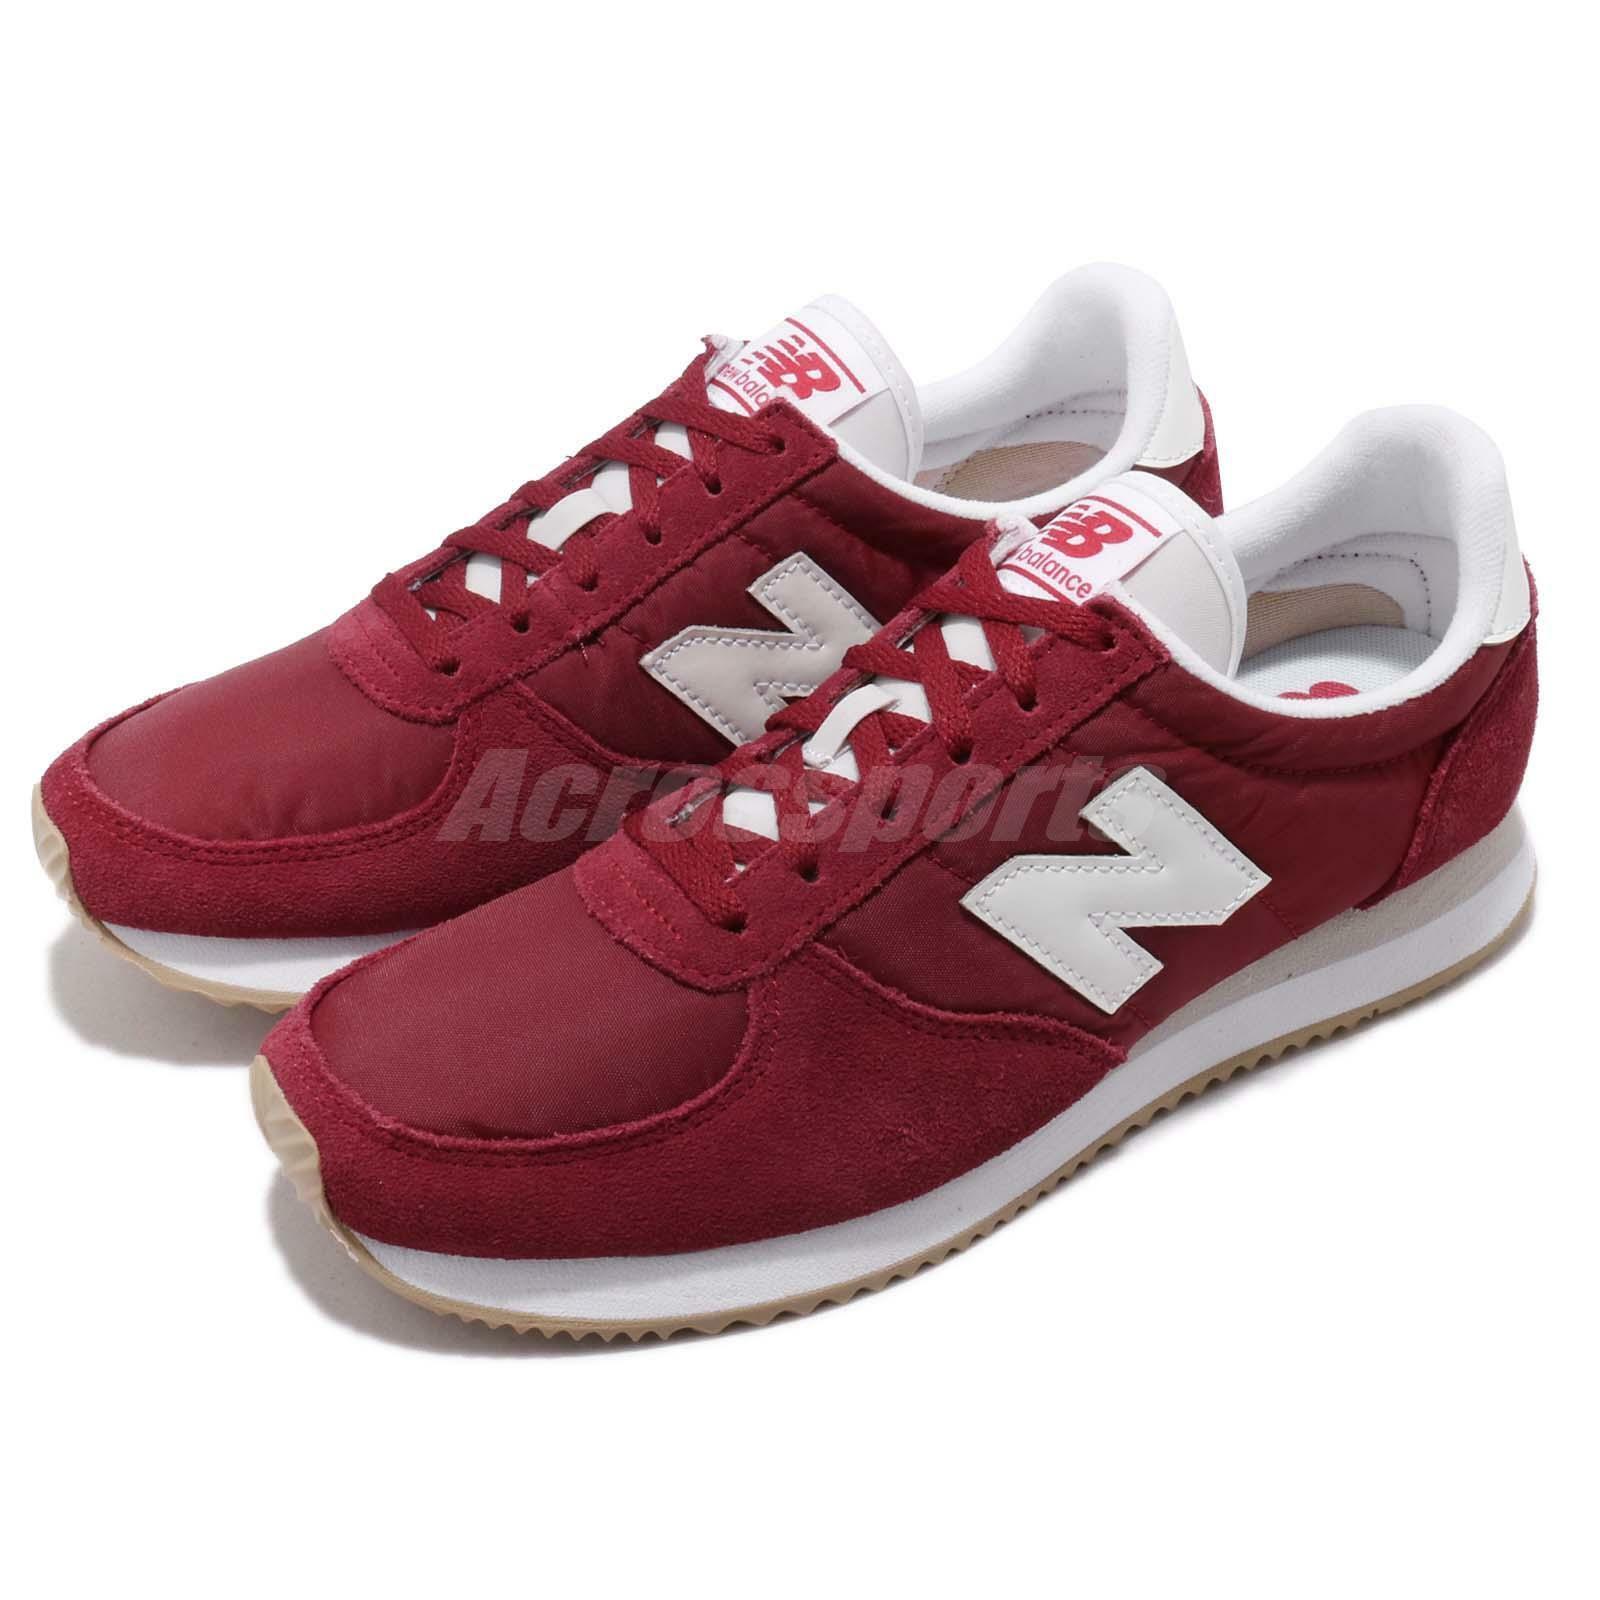 New Balance WL220CRA B Red White Gum Women Running shoes Sneakers WL220CRAB